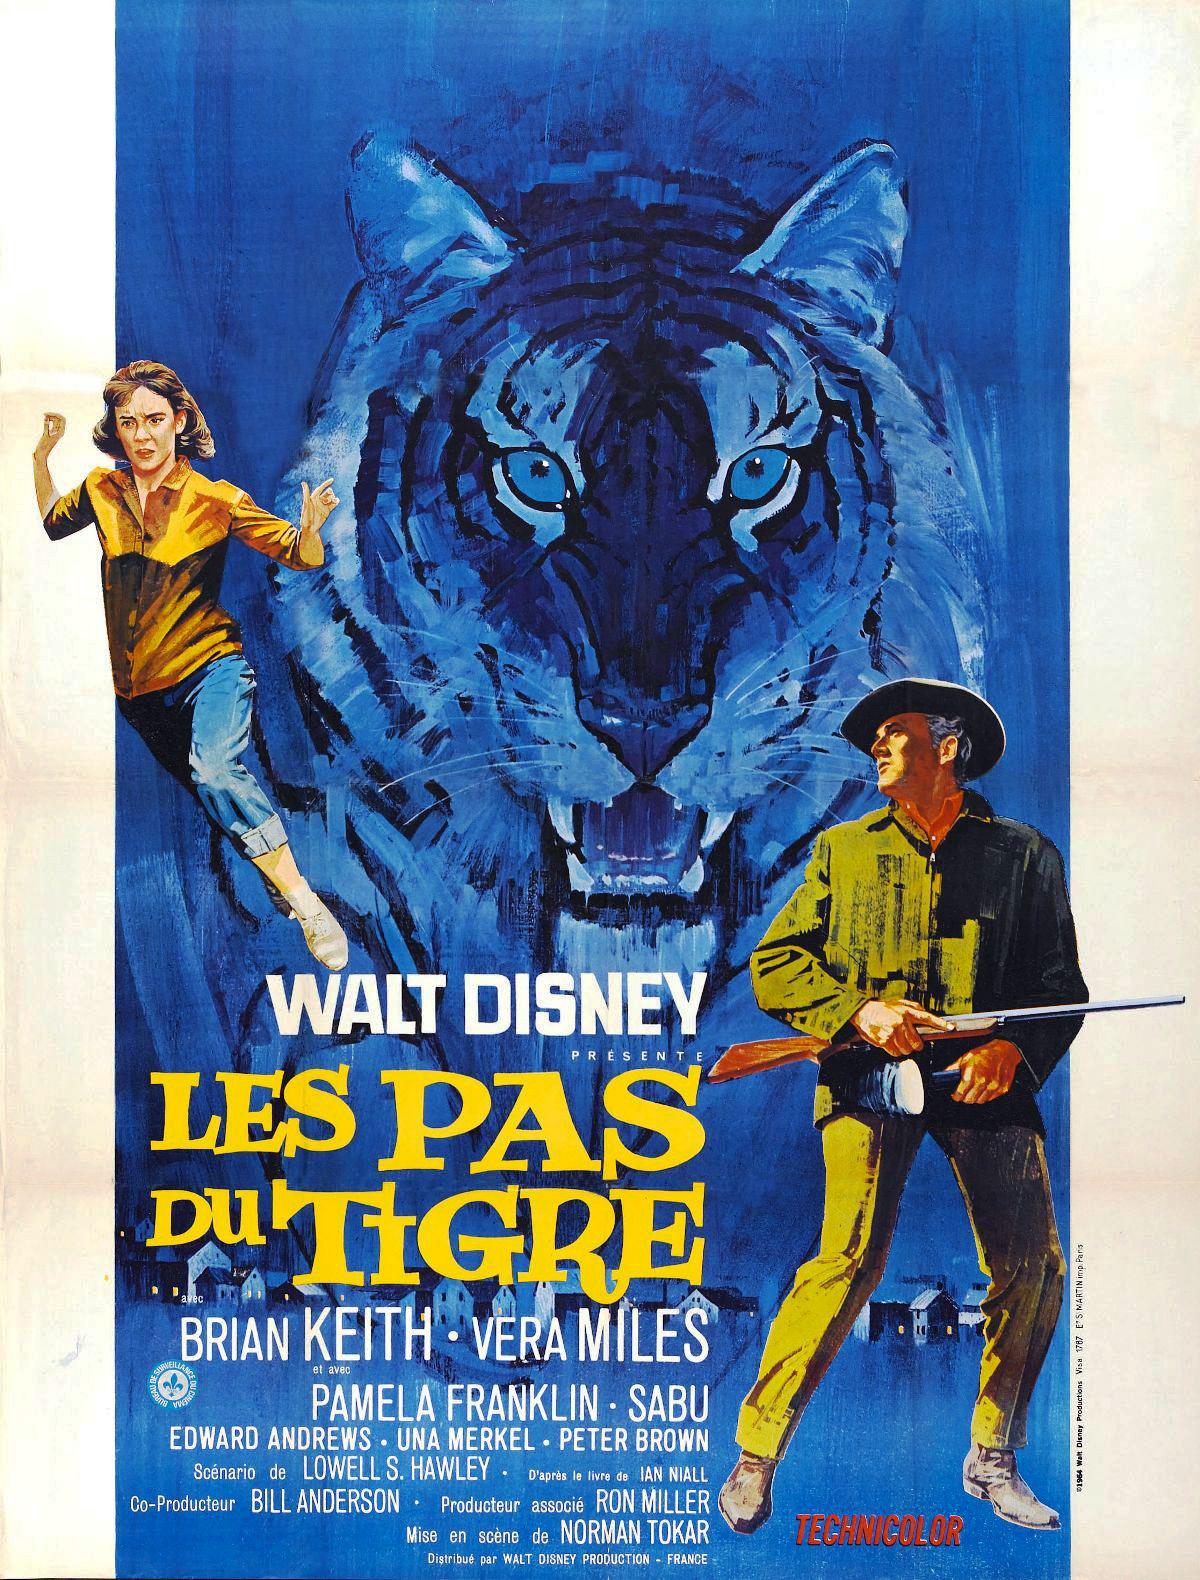 Affiche Poster pas tigre tiger walks disney